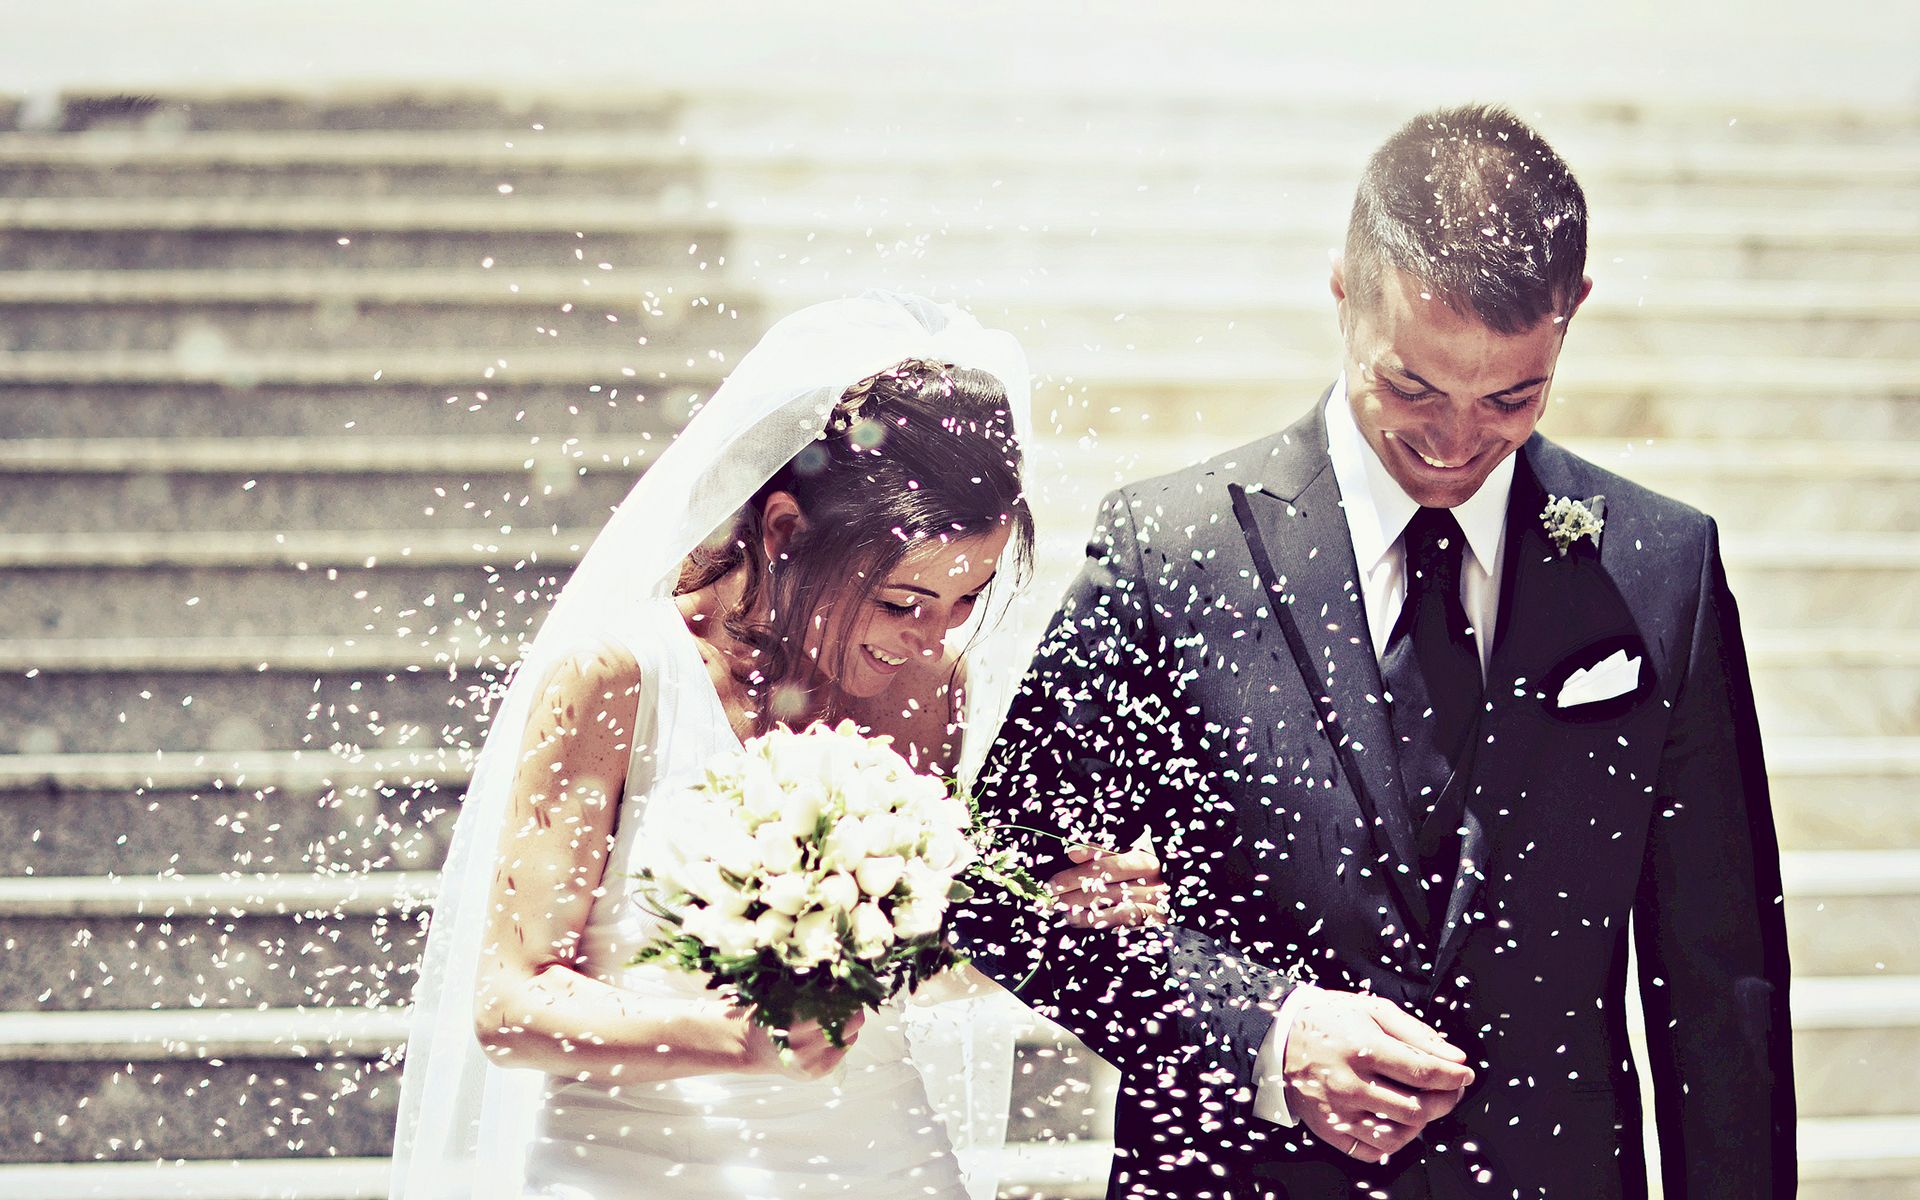 wedding cake backgrounds